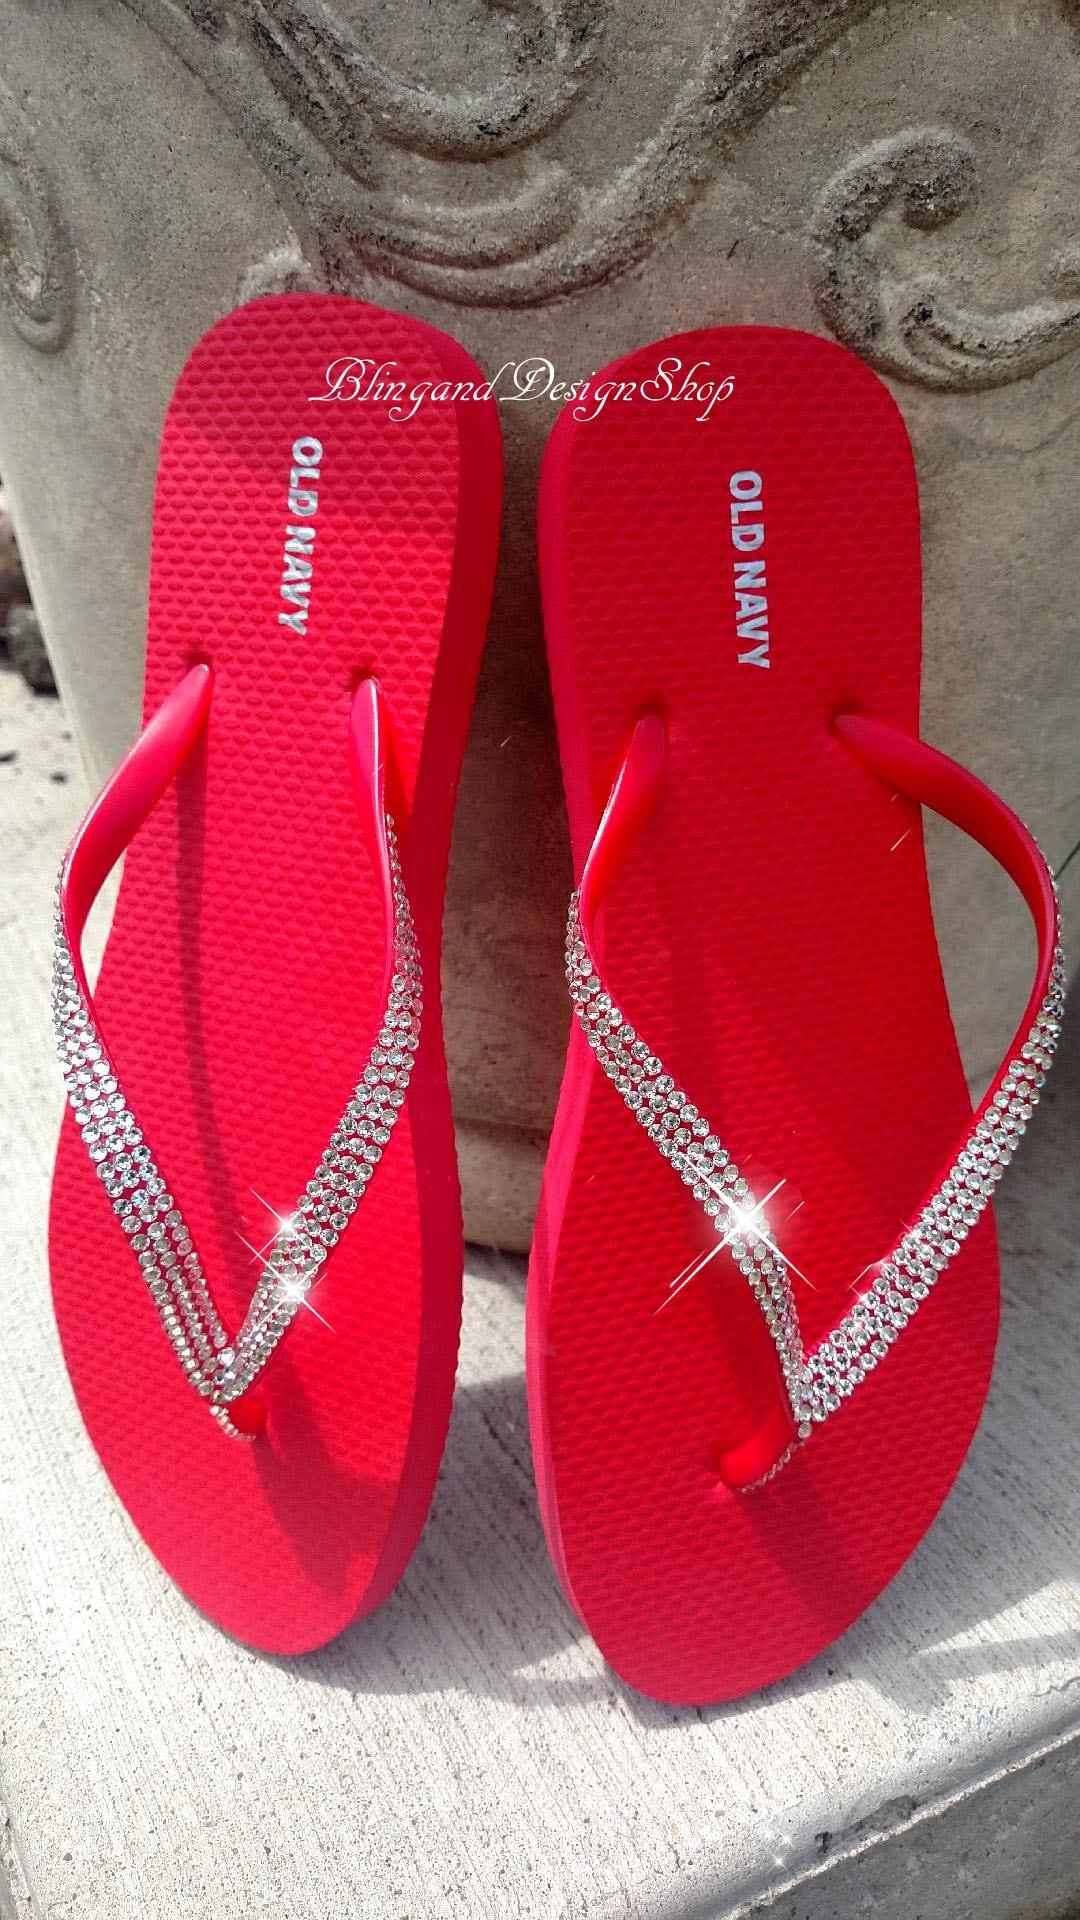 46ebf09300dc2 Swarovski Womens Sandals Flip Flops Customized with Swarovski Crystals,  Beach Sandals, Bridal shoes Bling nike shoes